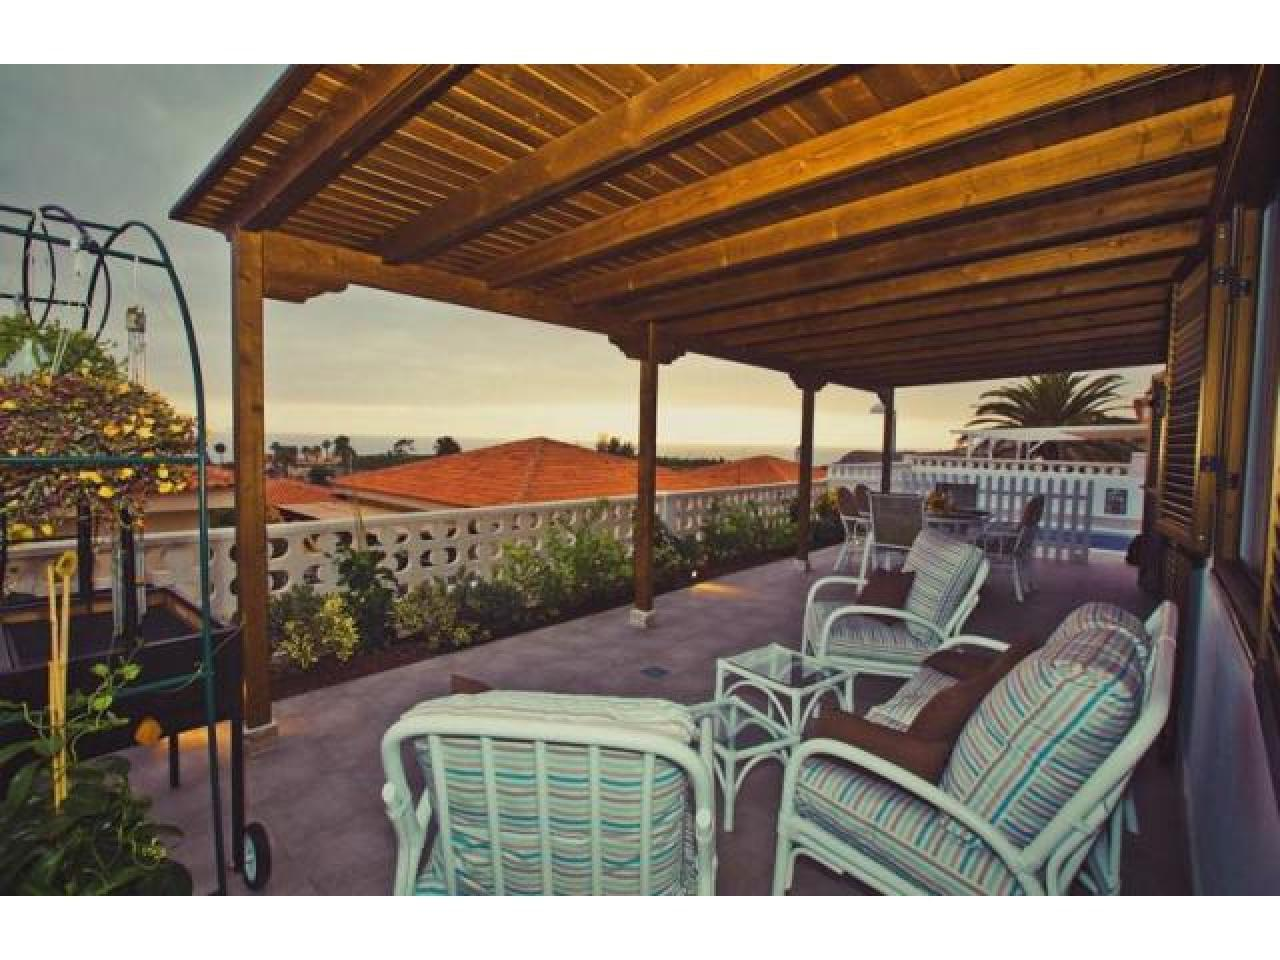 Spacious villa with views of the Atlantic Ocean. - 9